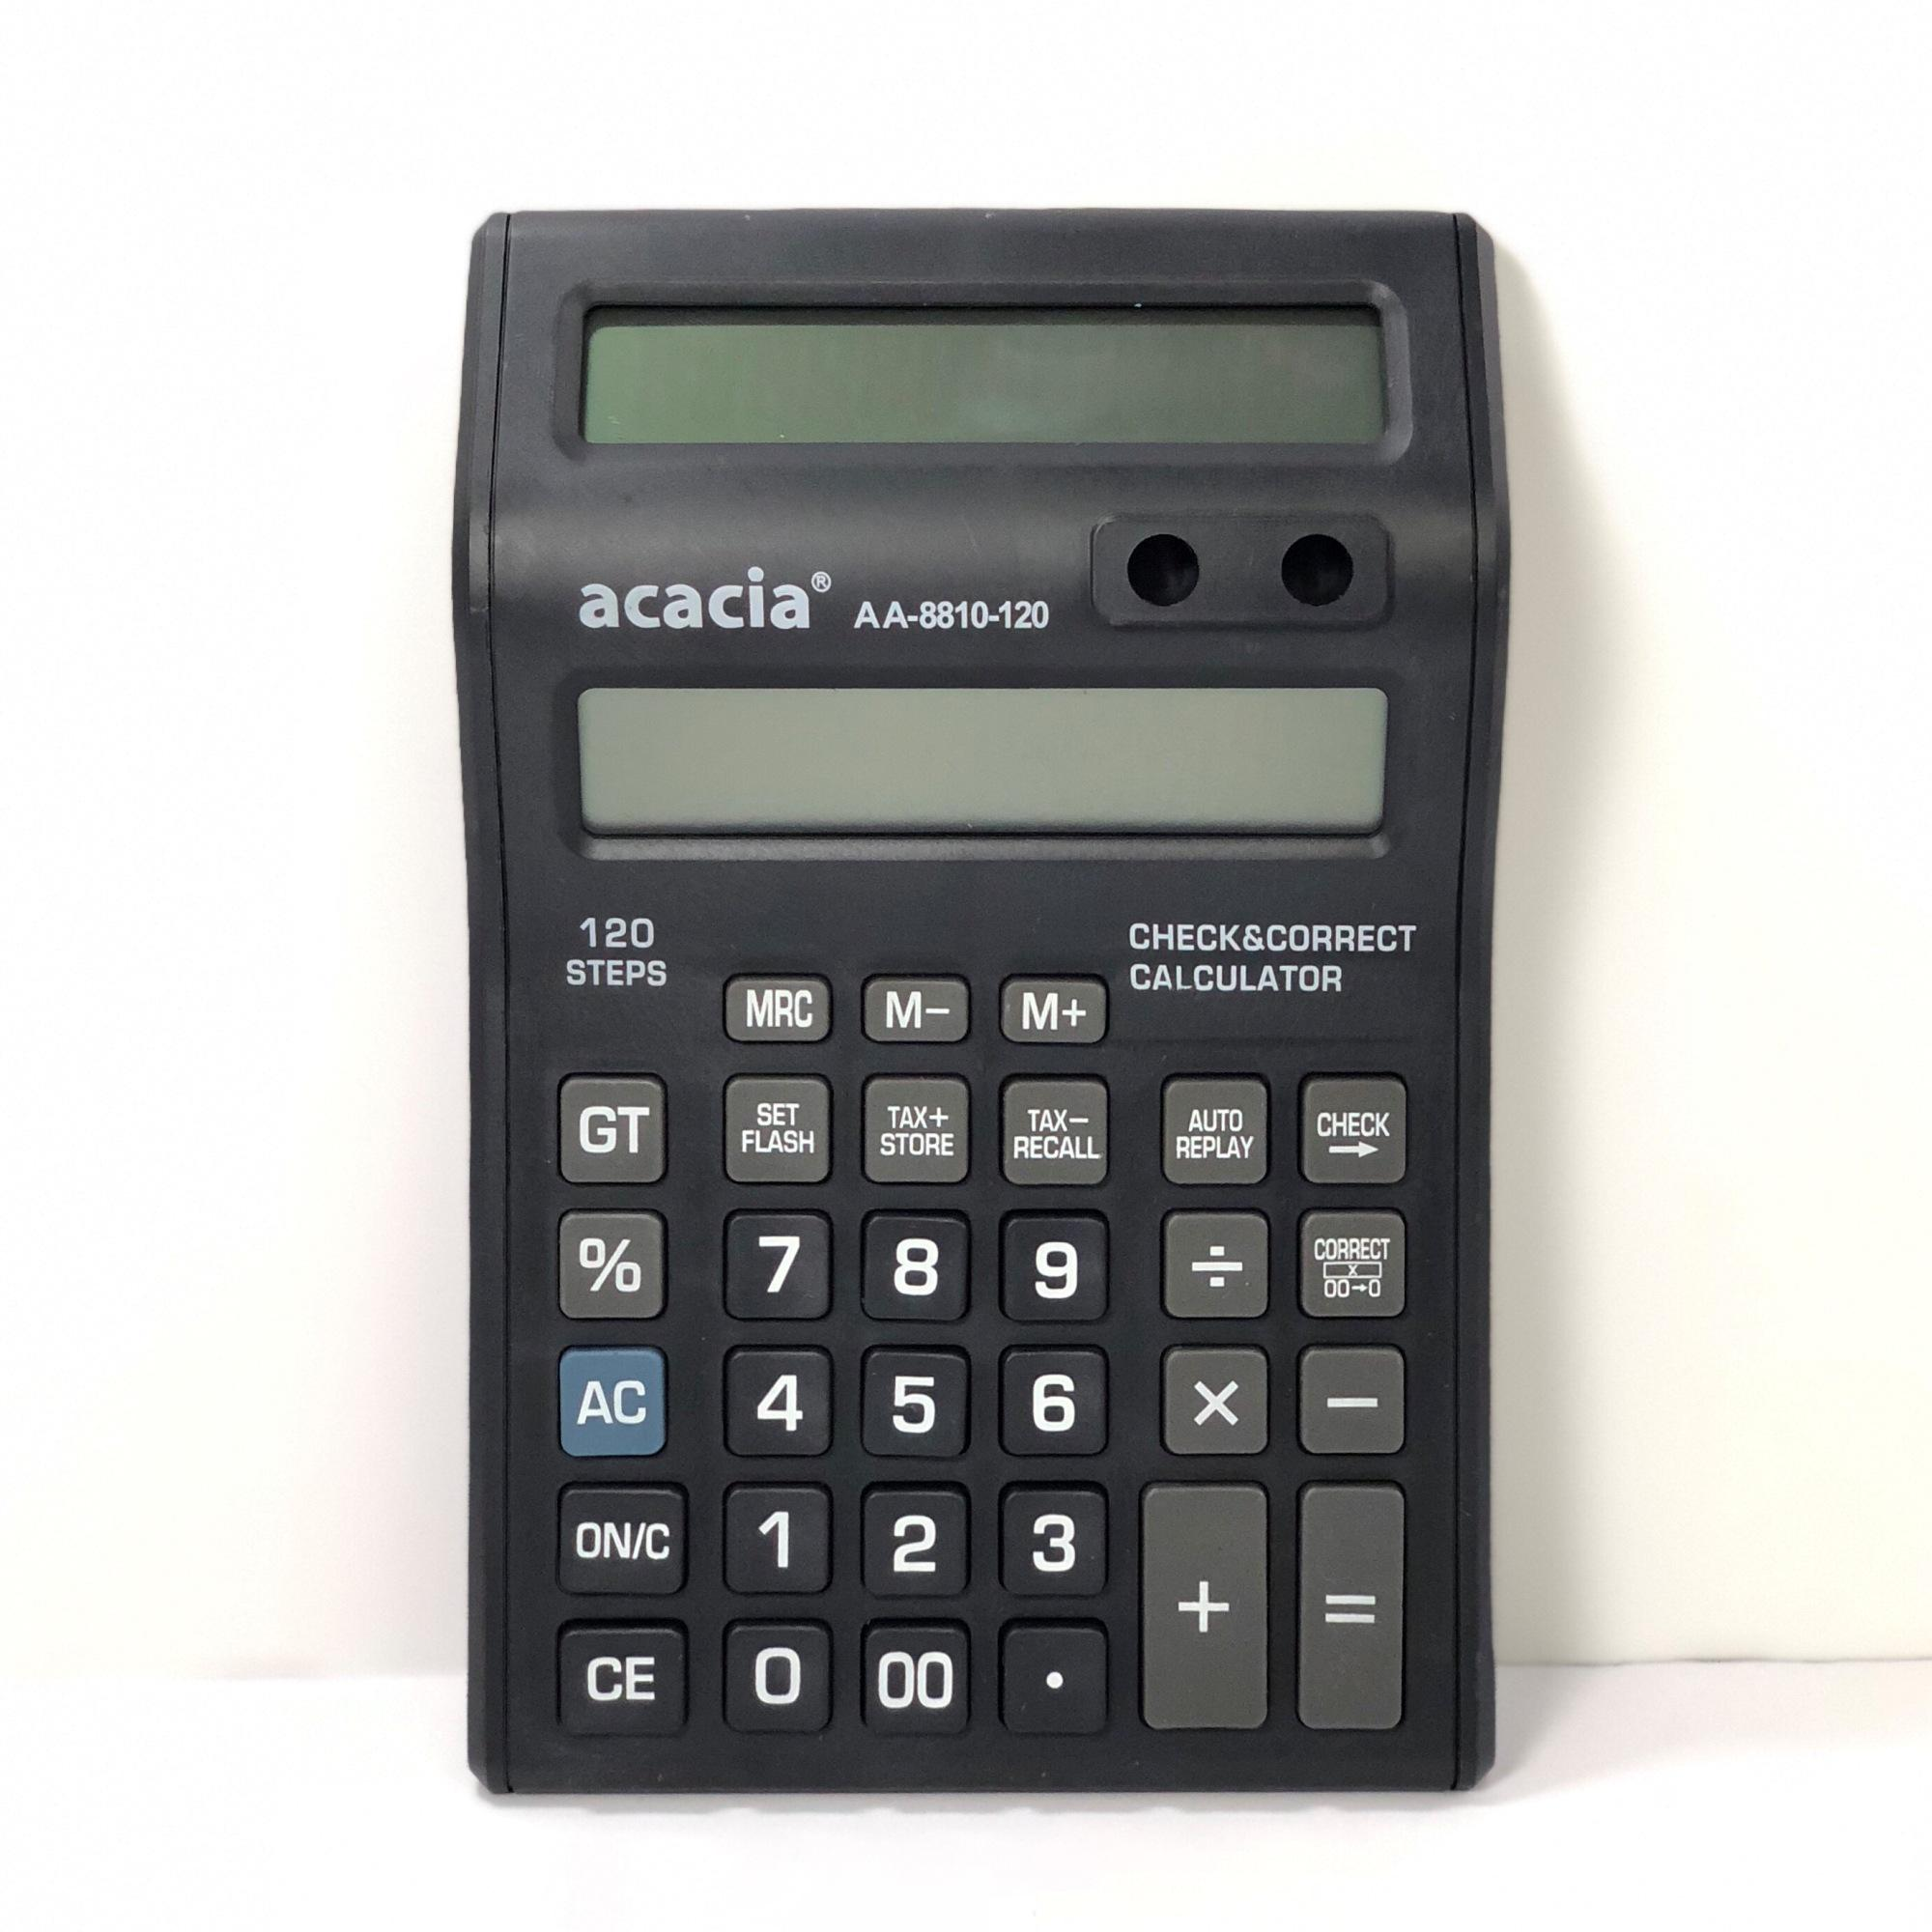 12 DIGITS ELECTRONIC CALCULATOR AA-8810-120